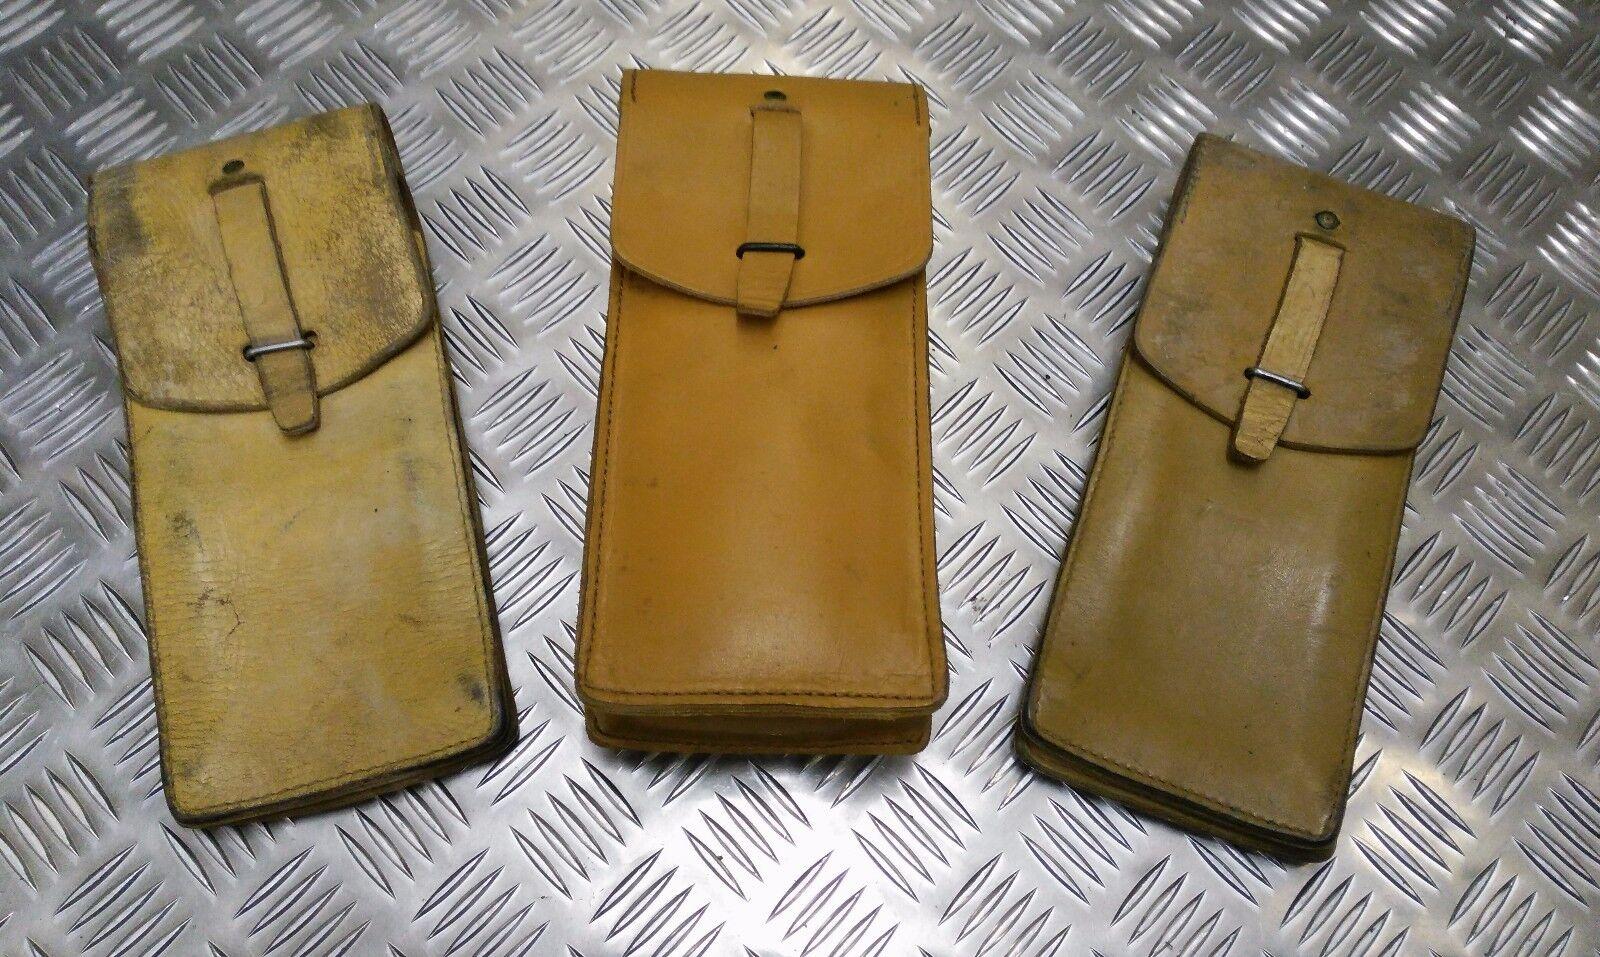 Vintage 1960s/1970s long leather utility/tool bag light tan brown-show original title